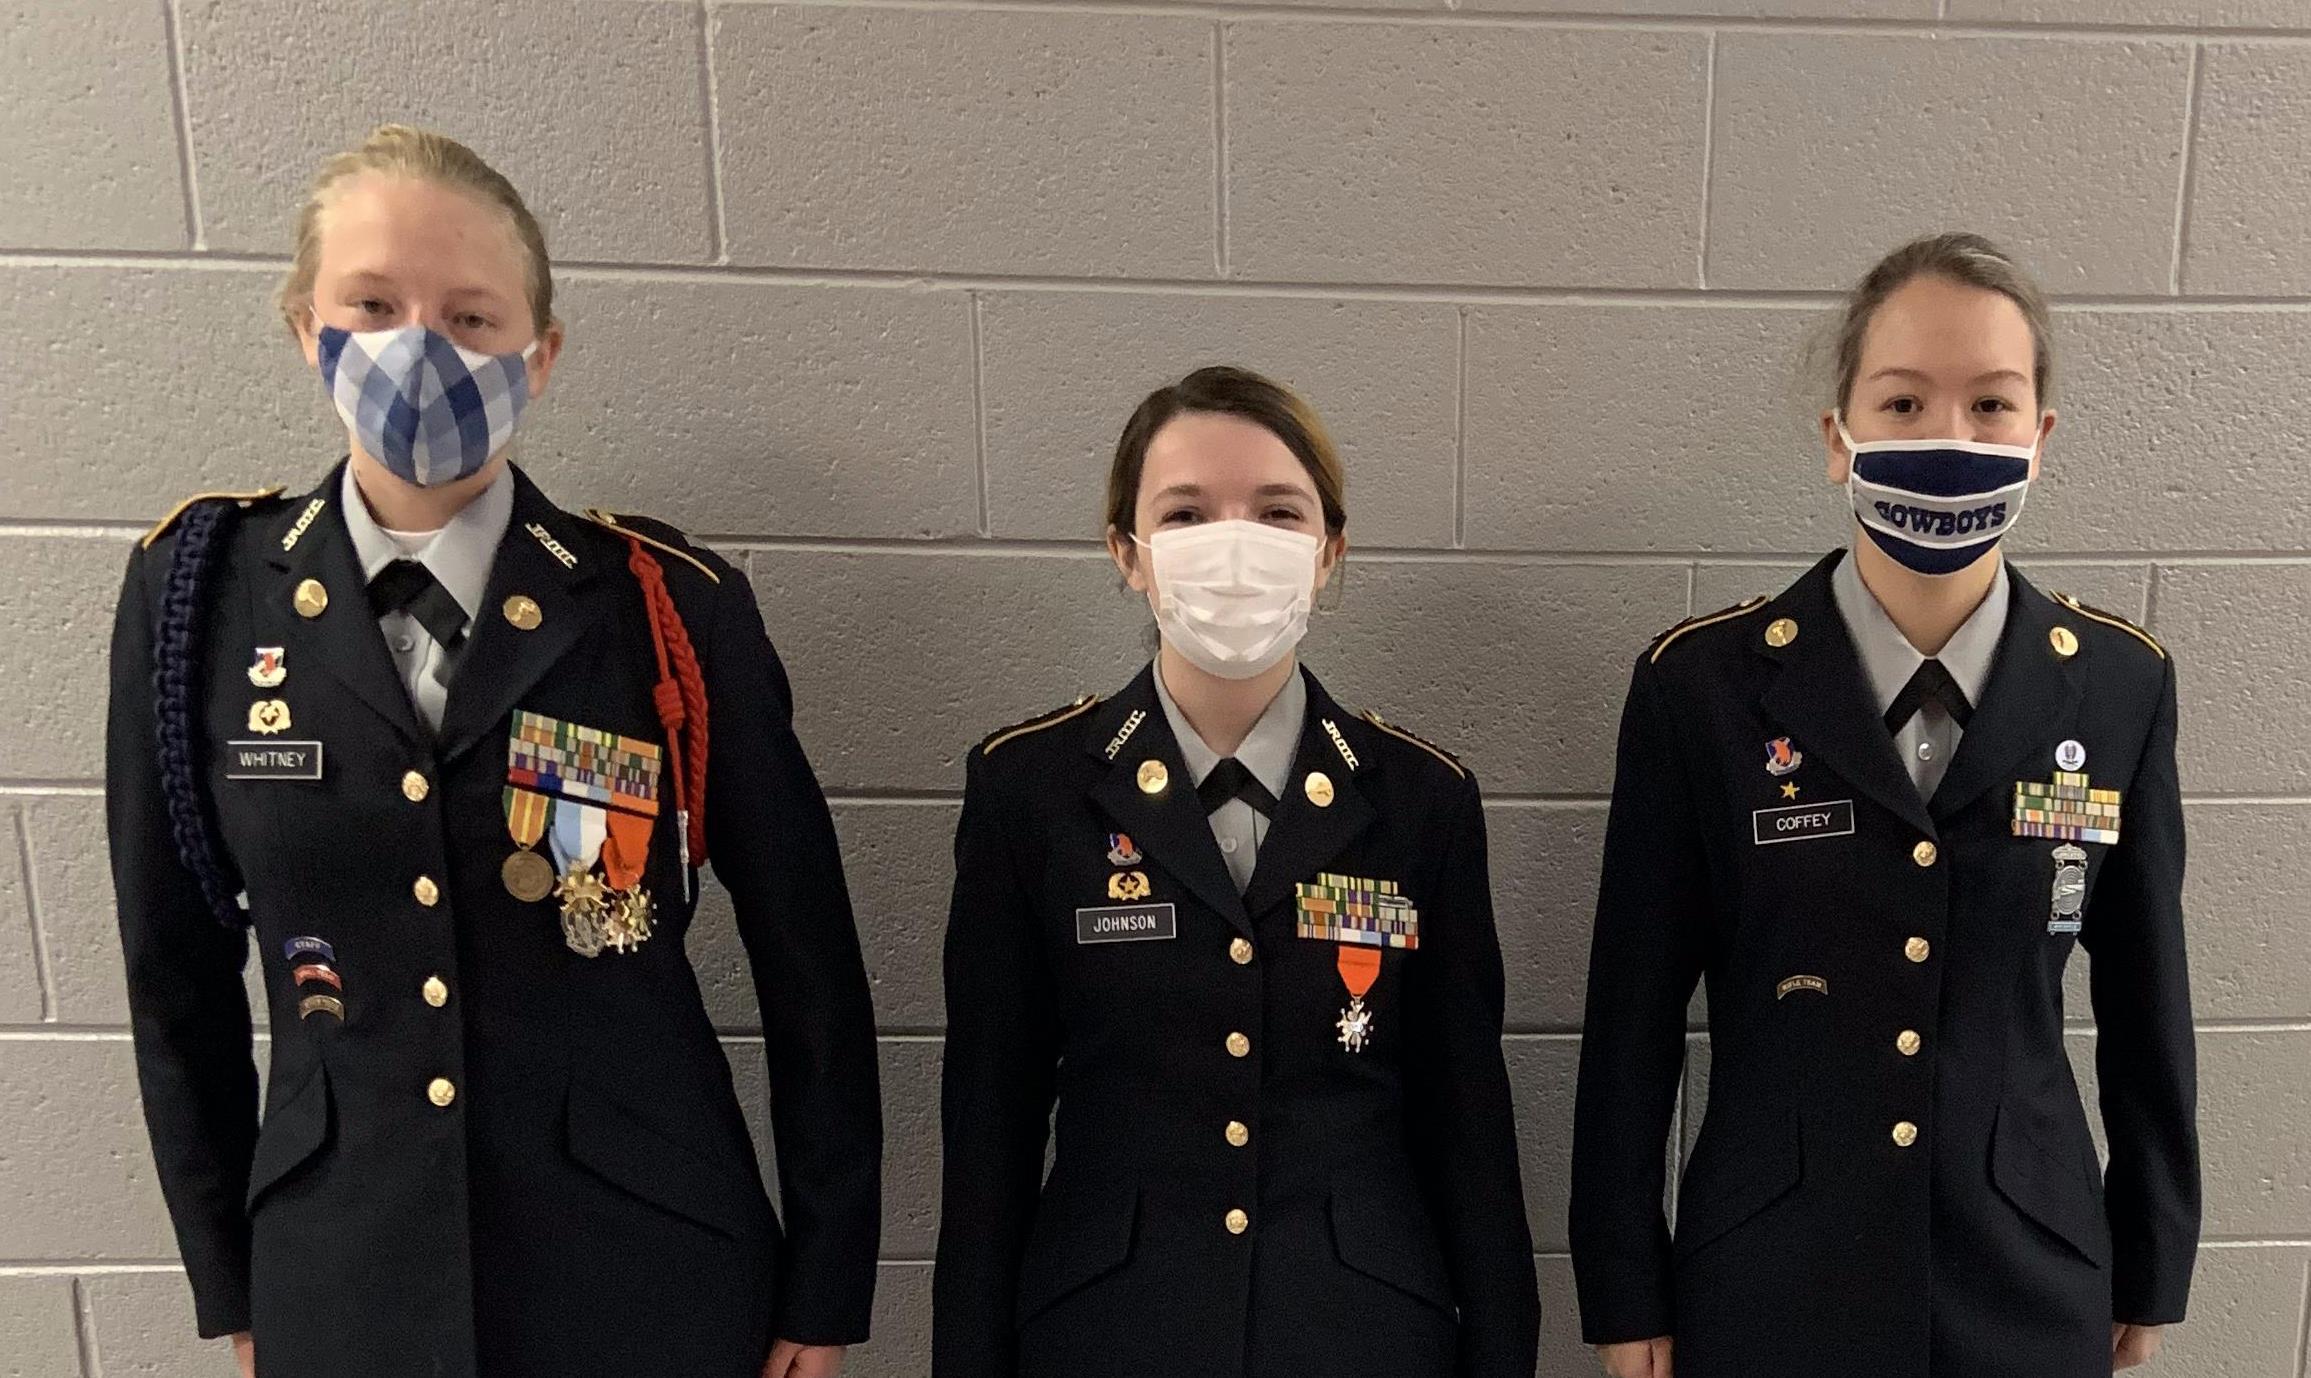 JROTC students in uniform